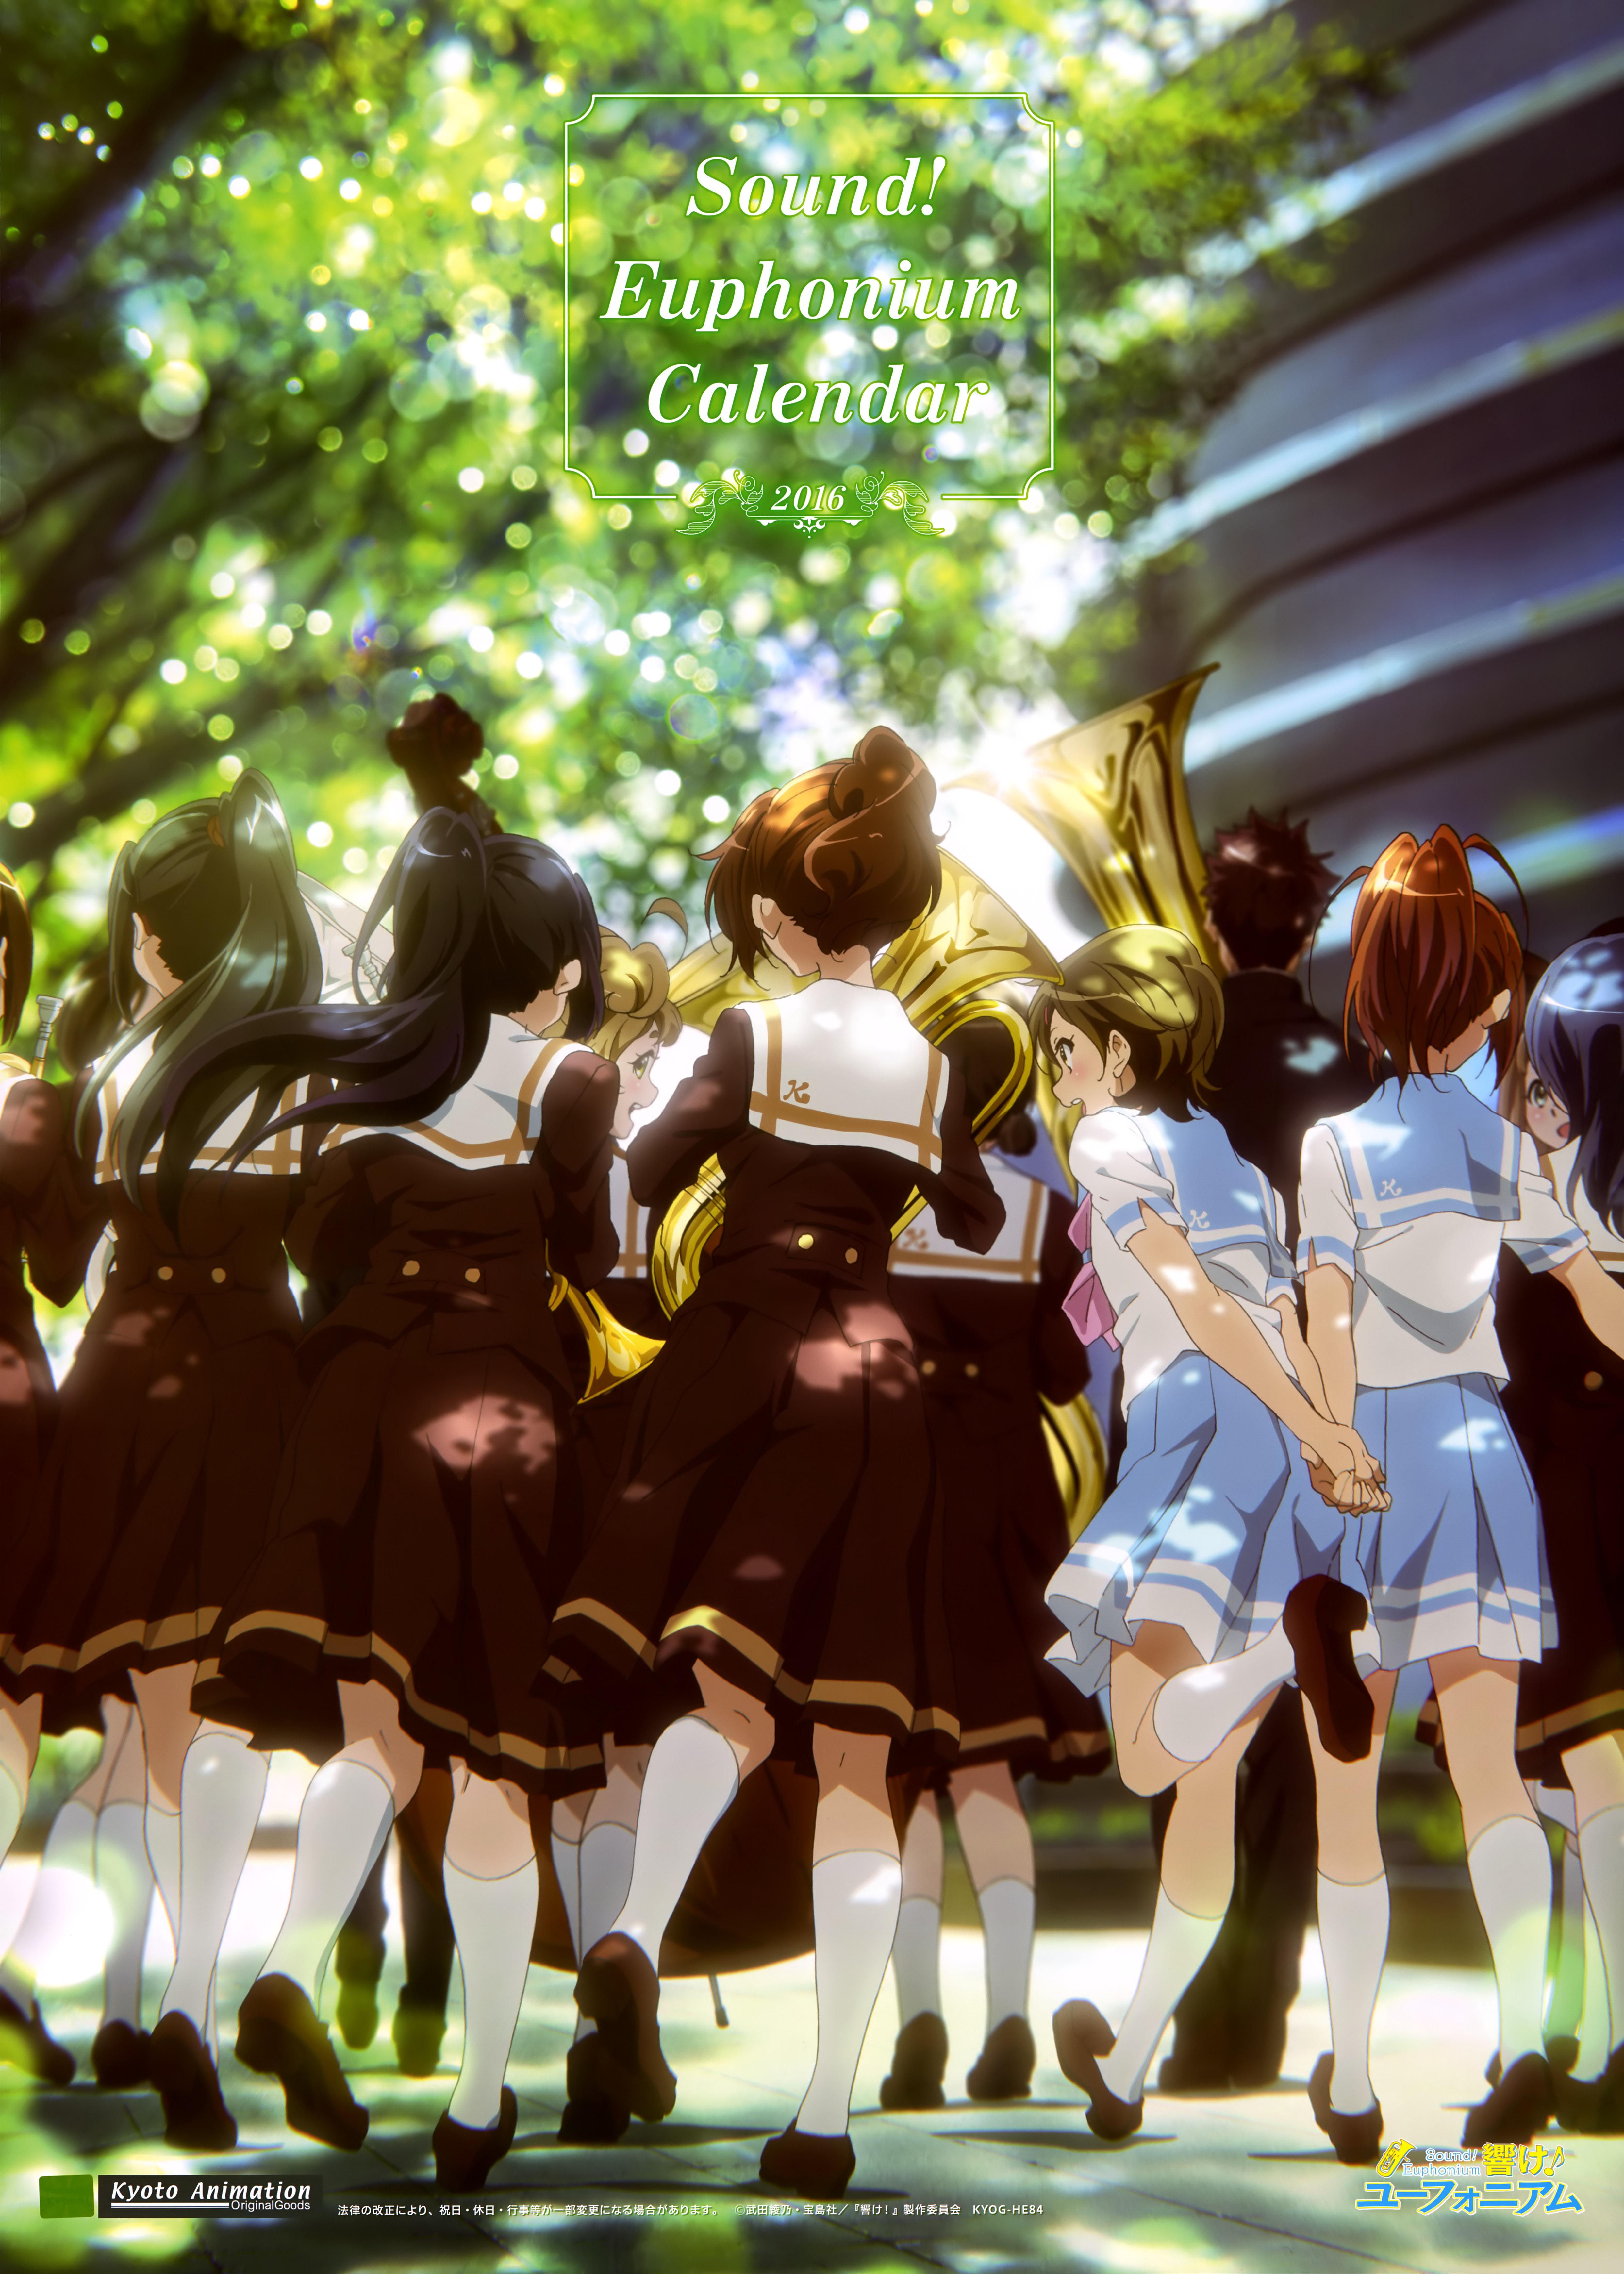 Hibike! Euphonium Anime calendar 2016 0000